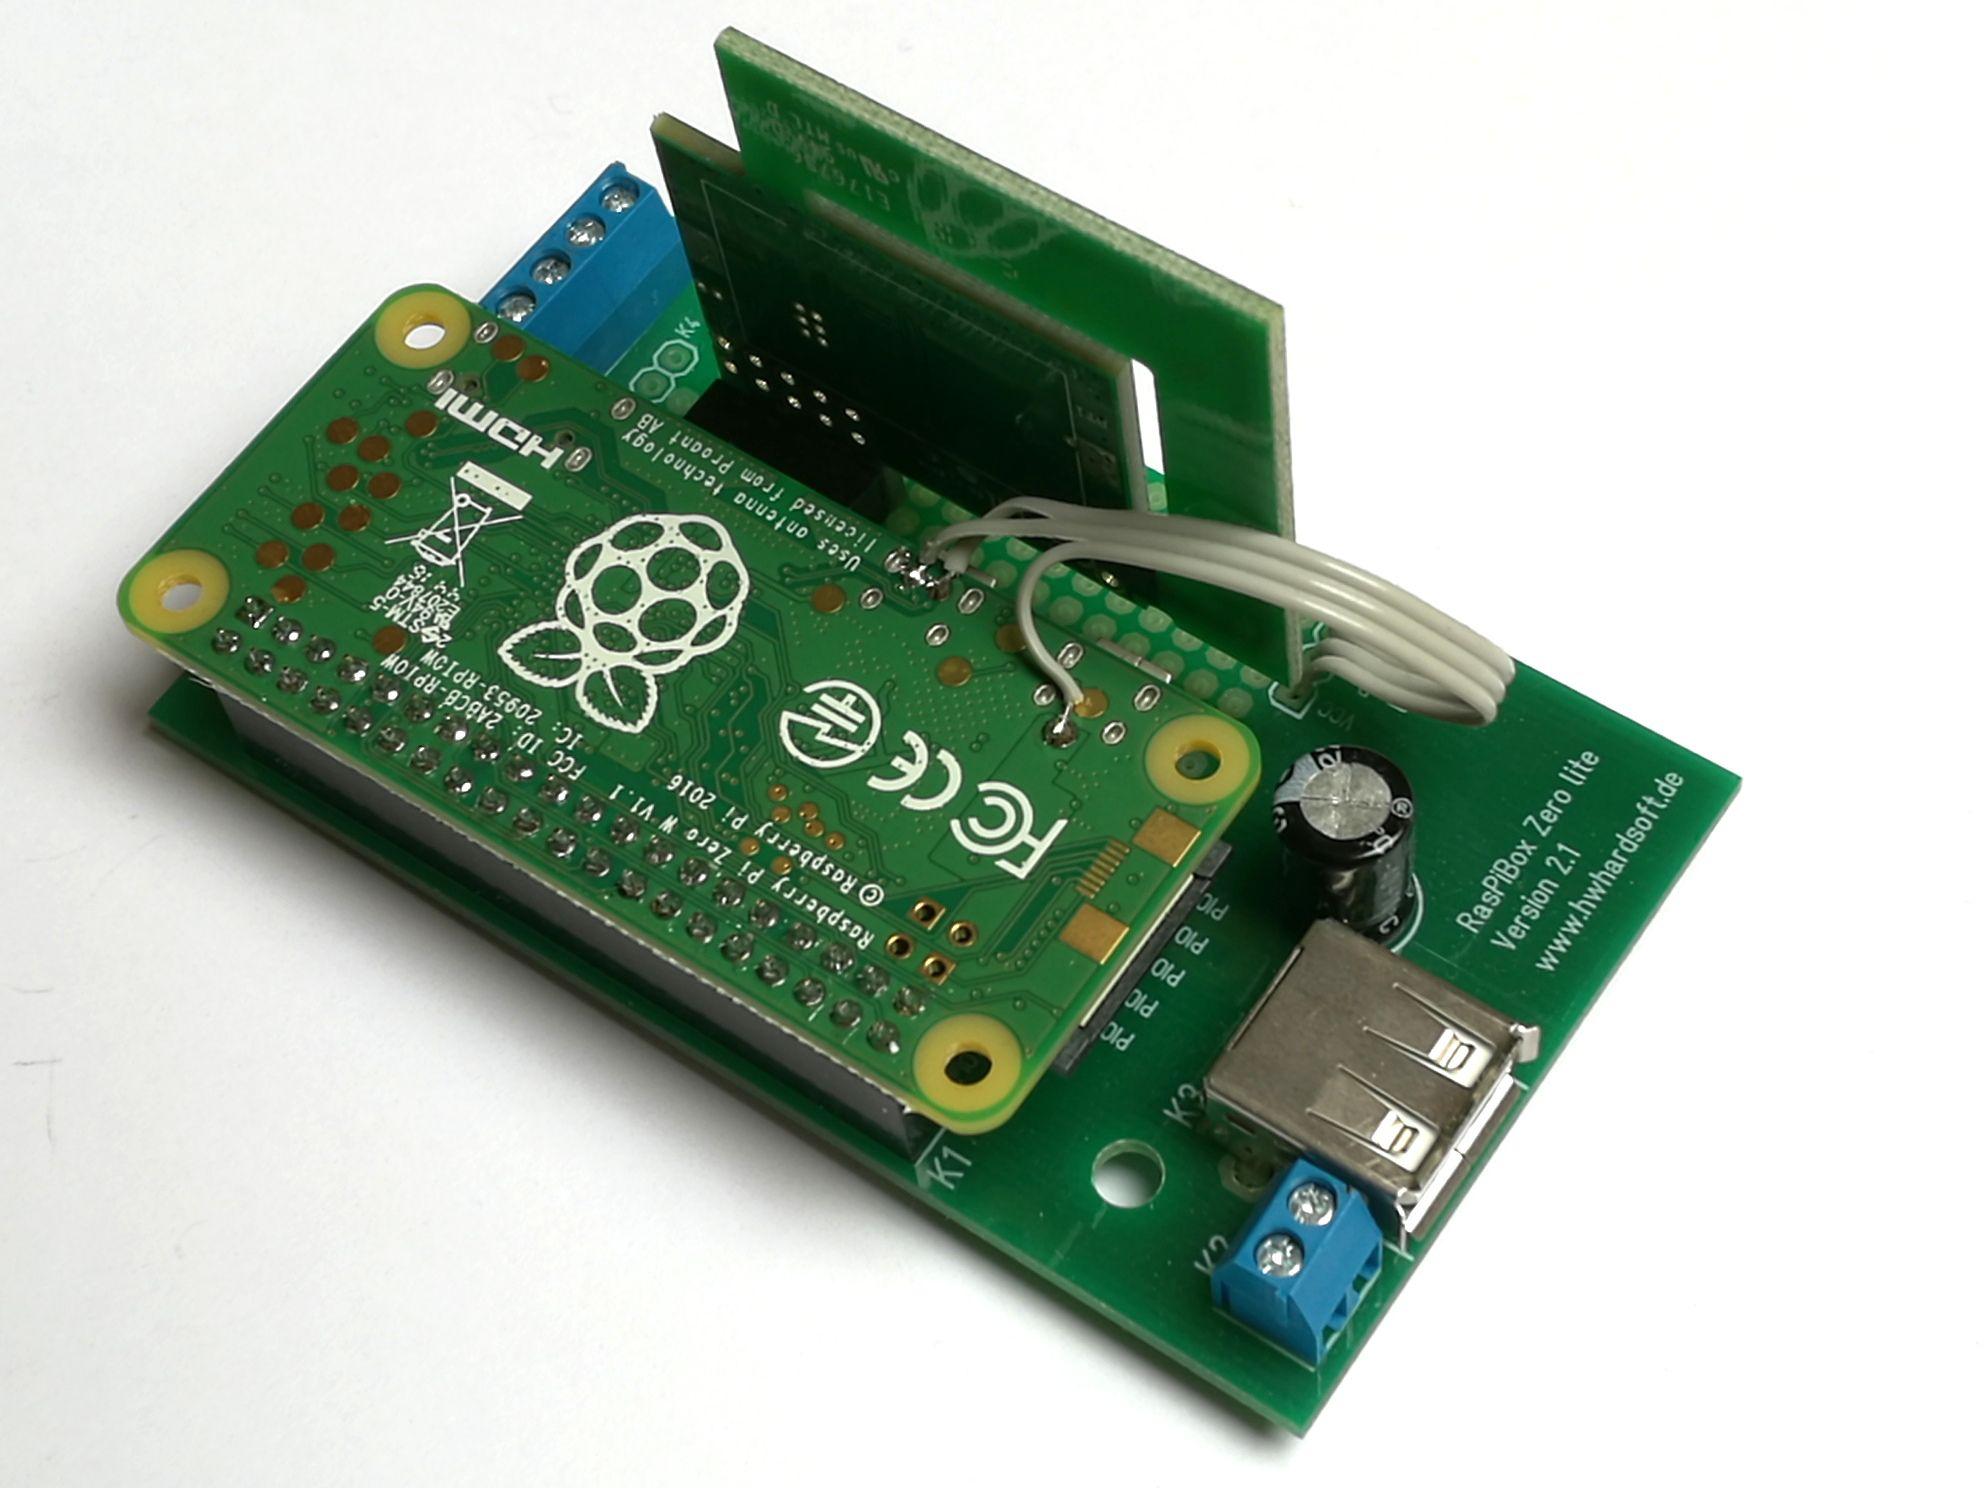 PiZero din rail enclosure with mounted Razberry Z-wave wireless